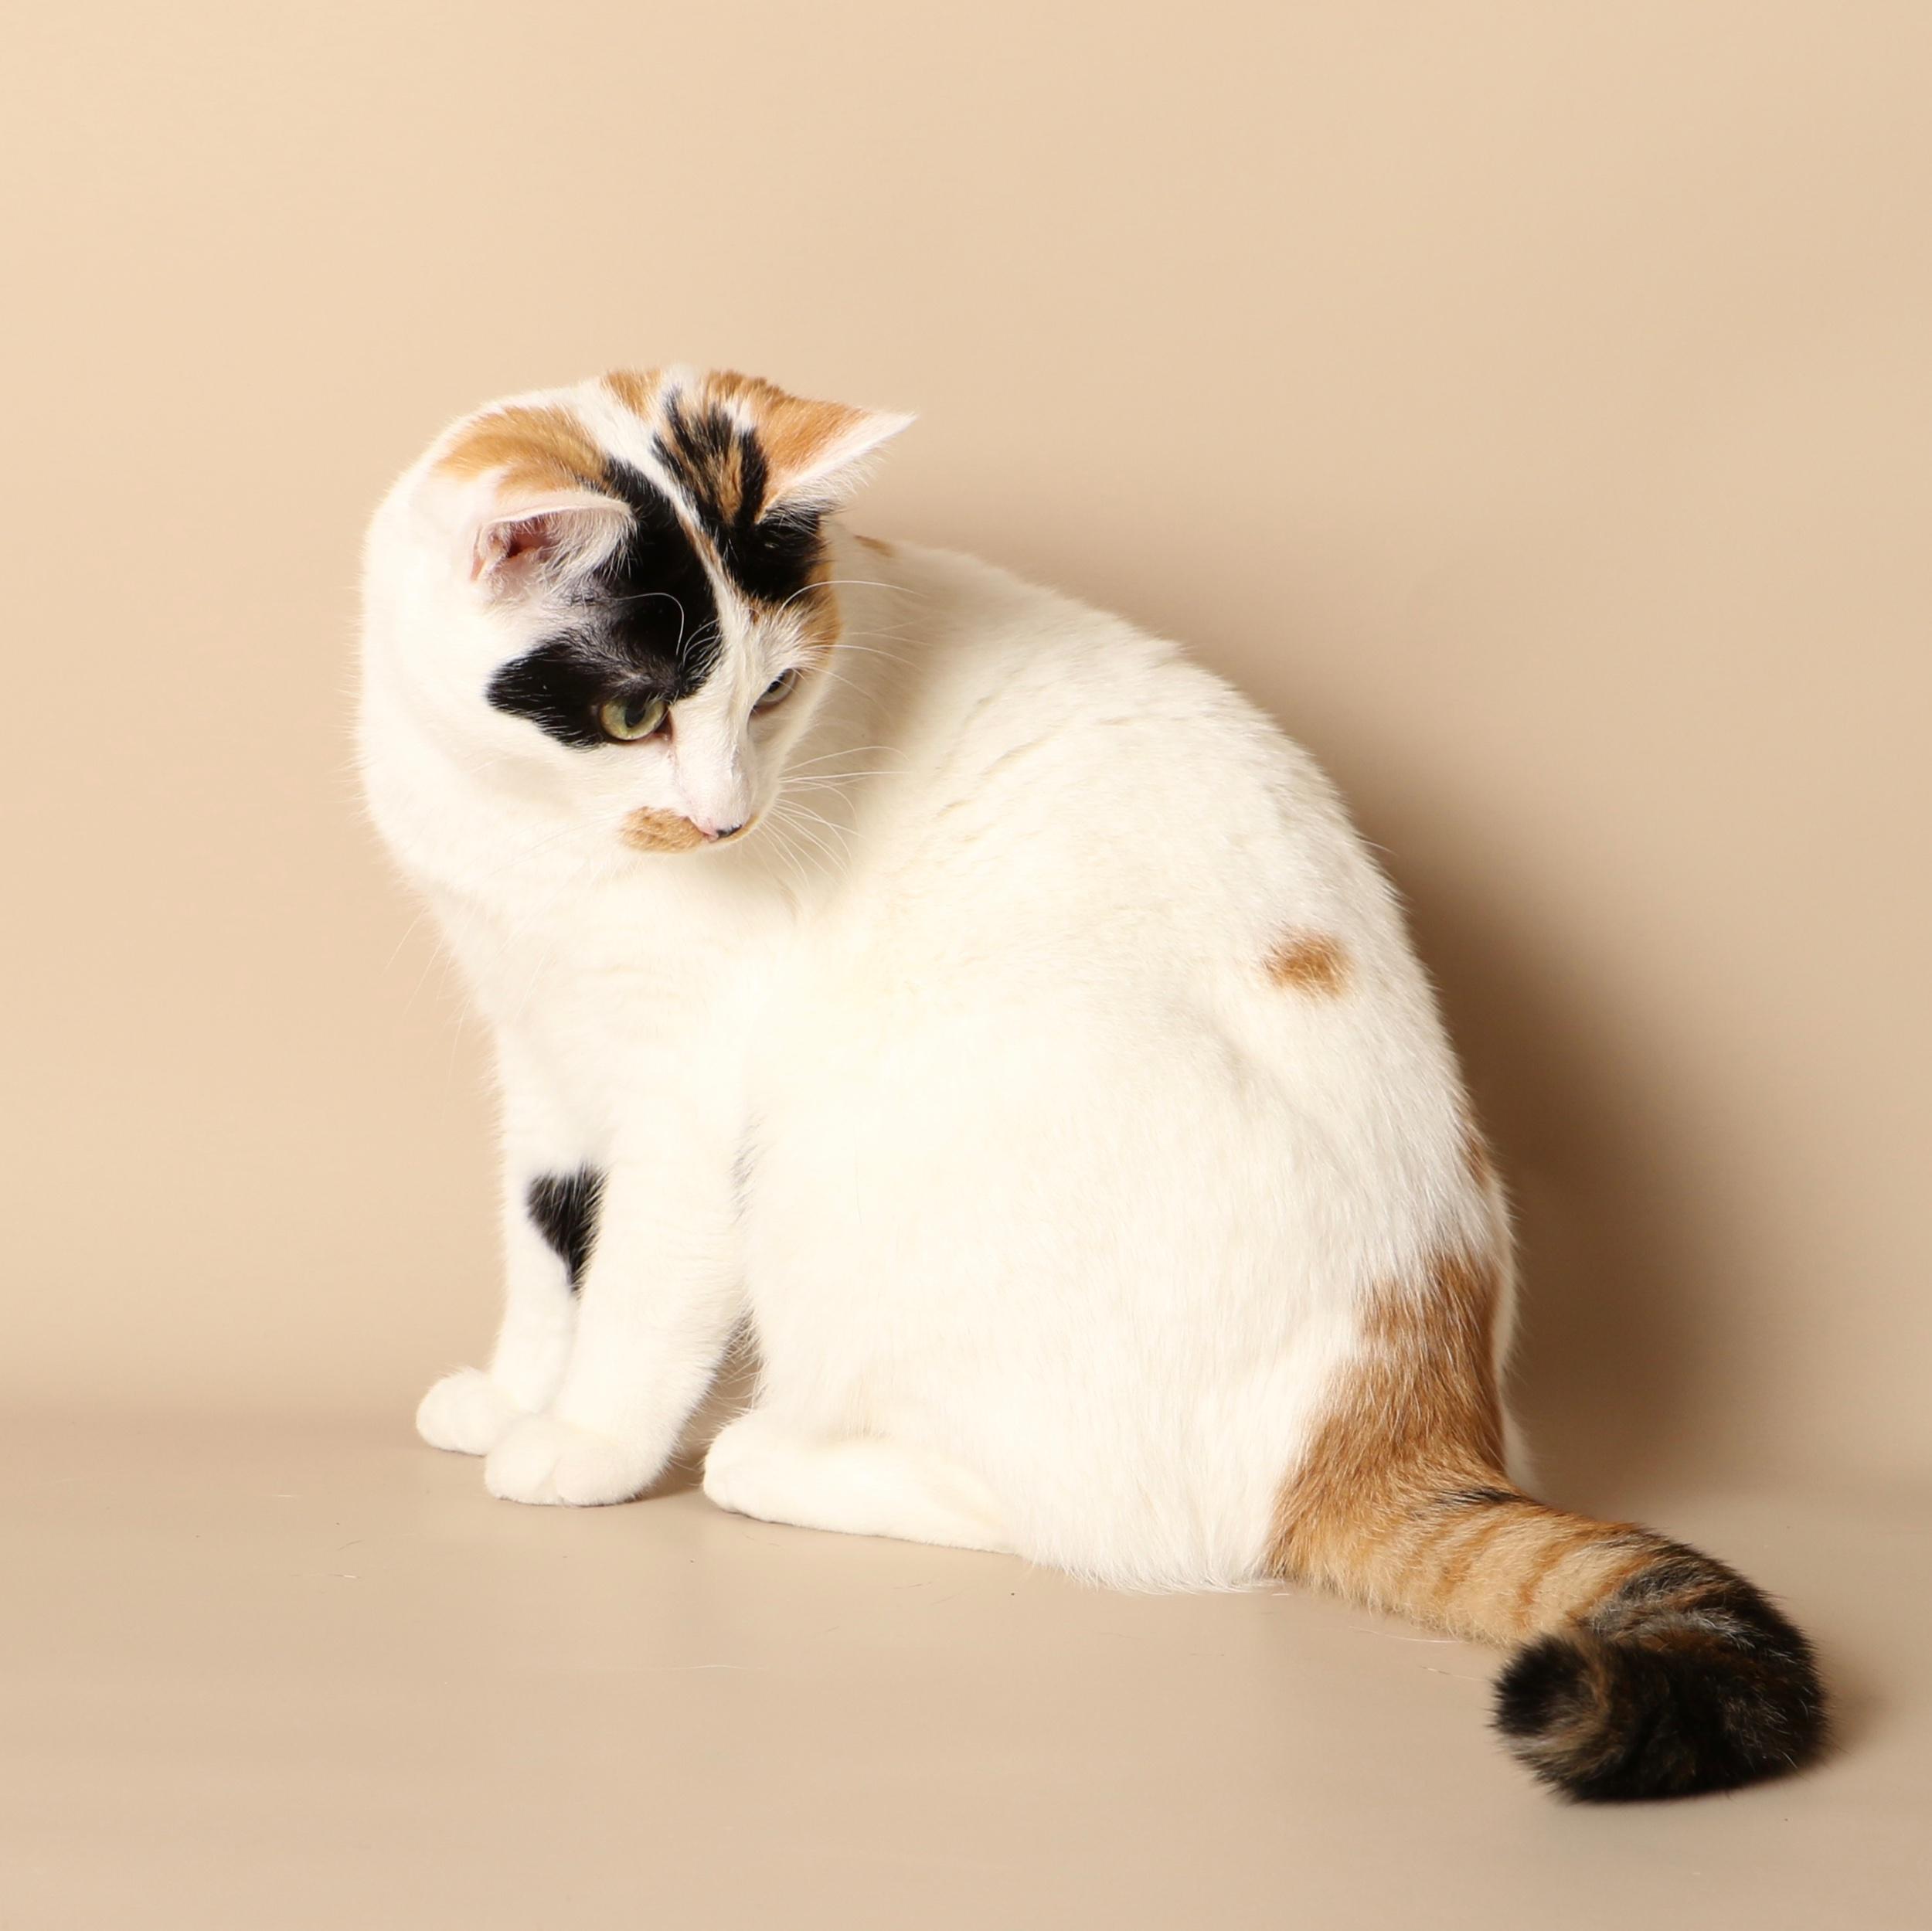 0969cats.jpeg